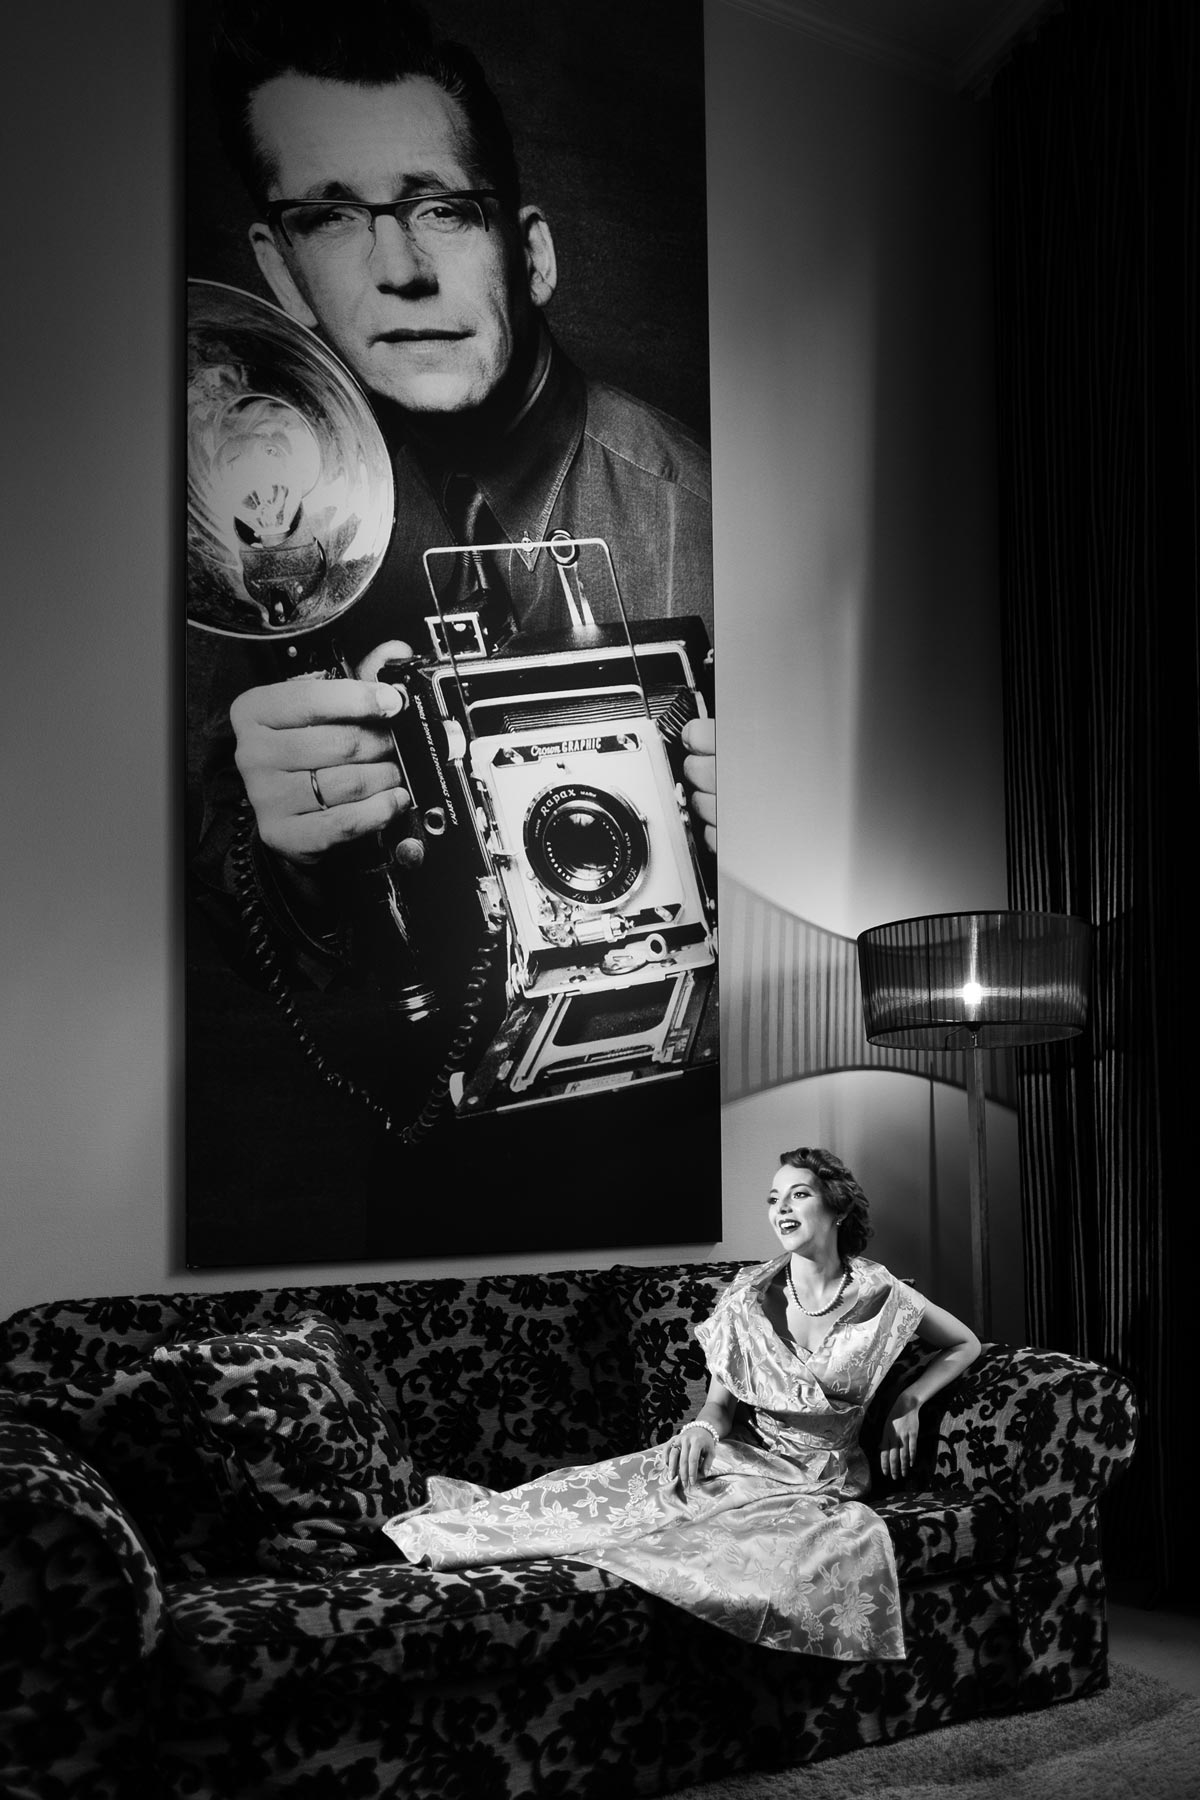 Rina Bambina in Stage 47 Hotel, Dusseldorf. Monochrome by Damien Lovegrove